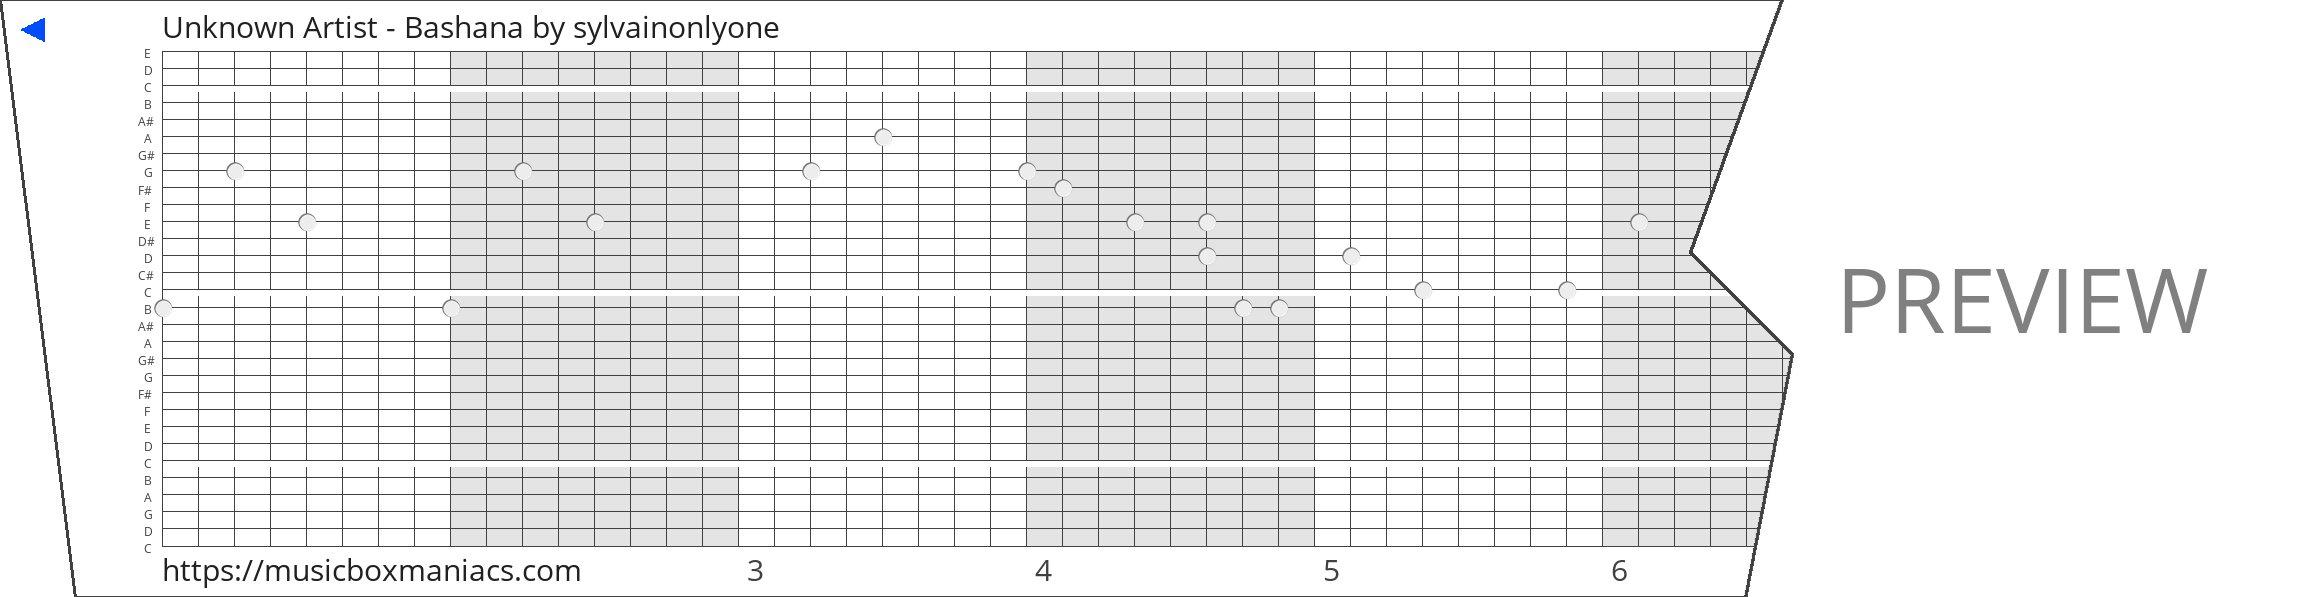 Unknown Artist - Bashana 30 note music box paper strip